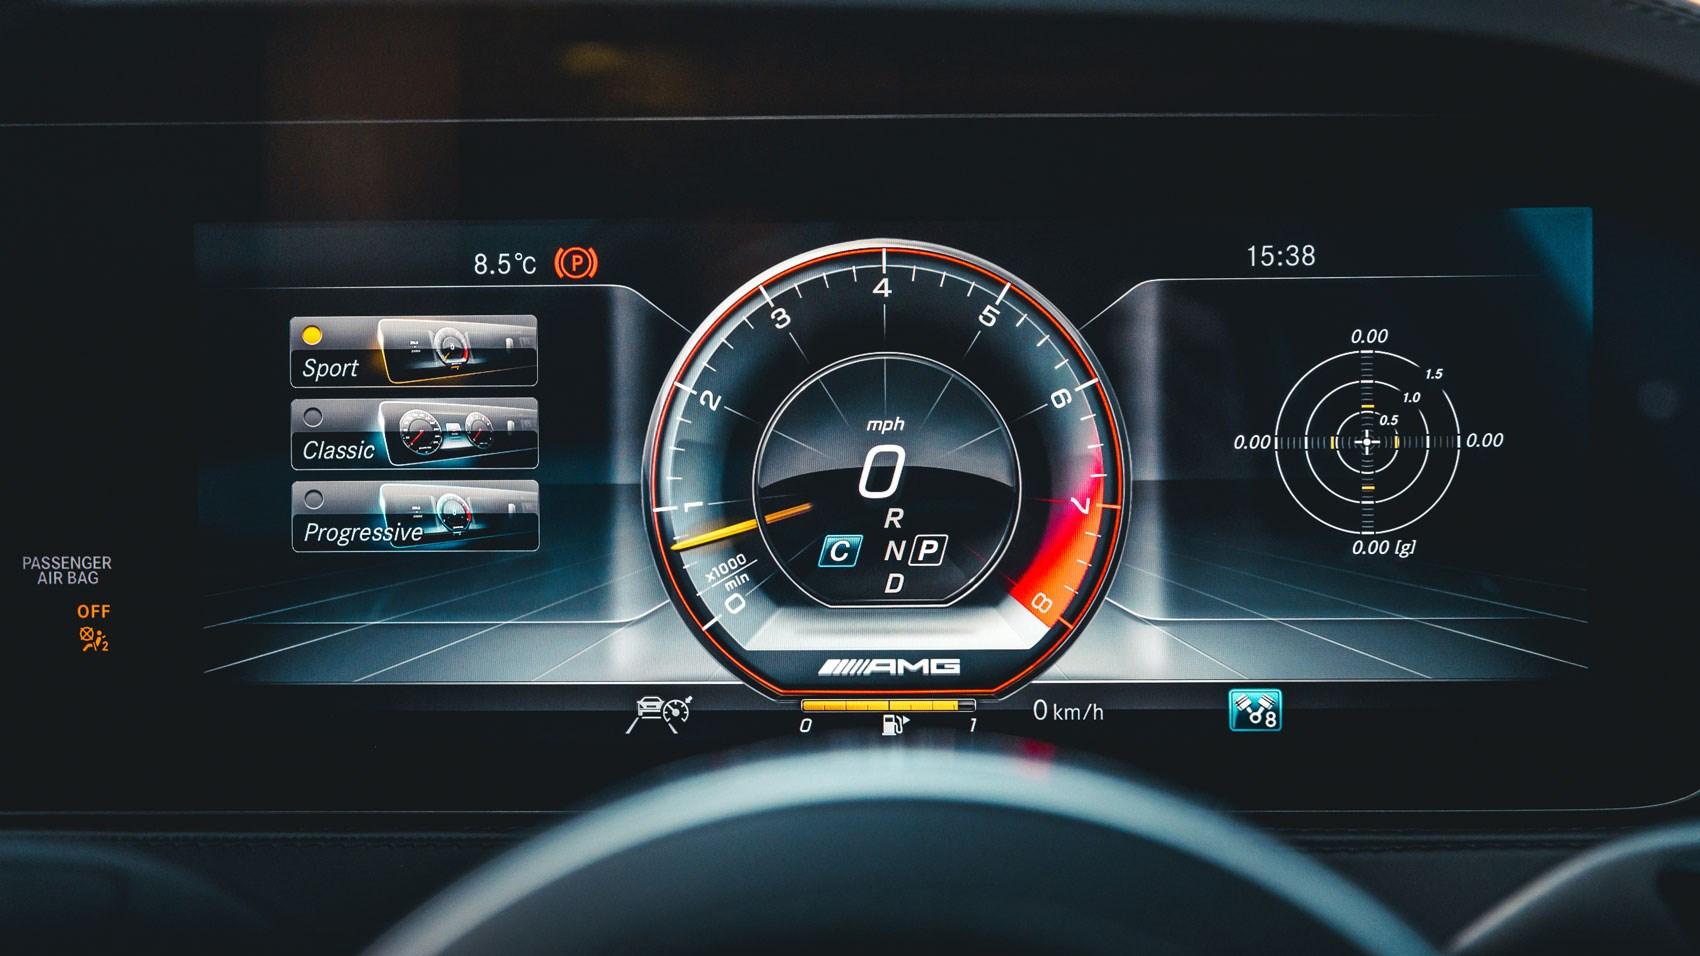 Mercedes-AMG S63 instrument cluster